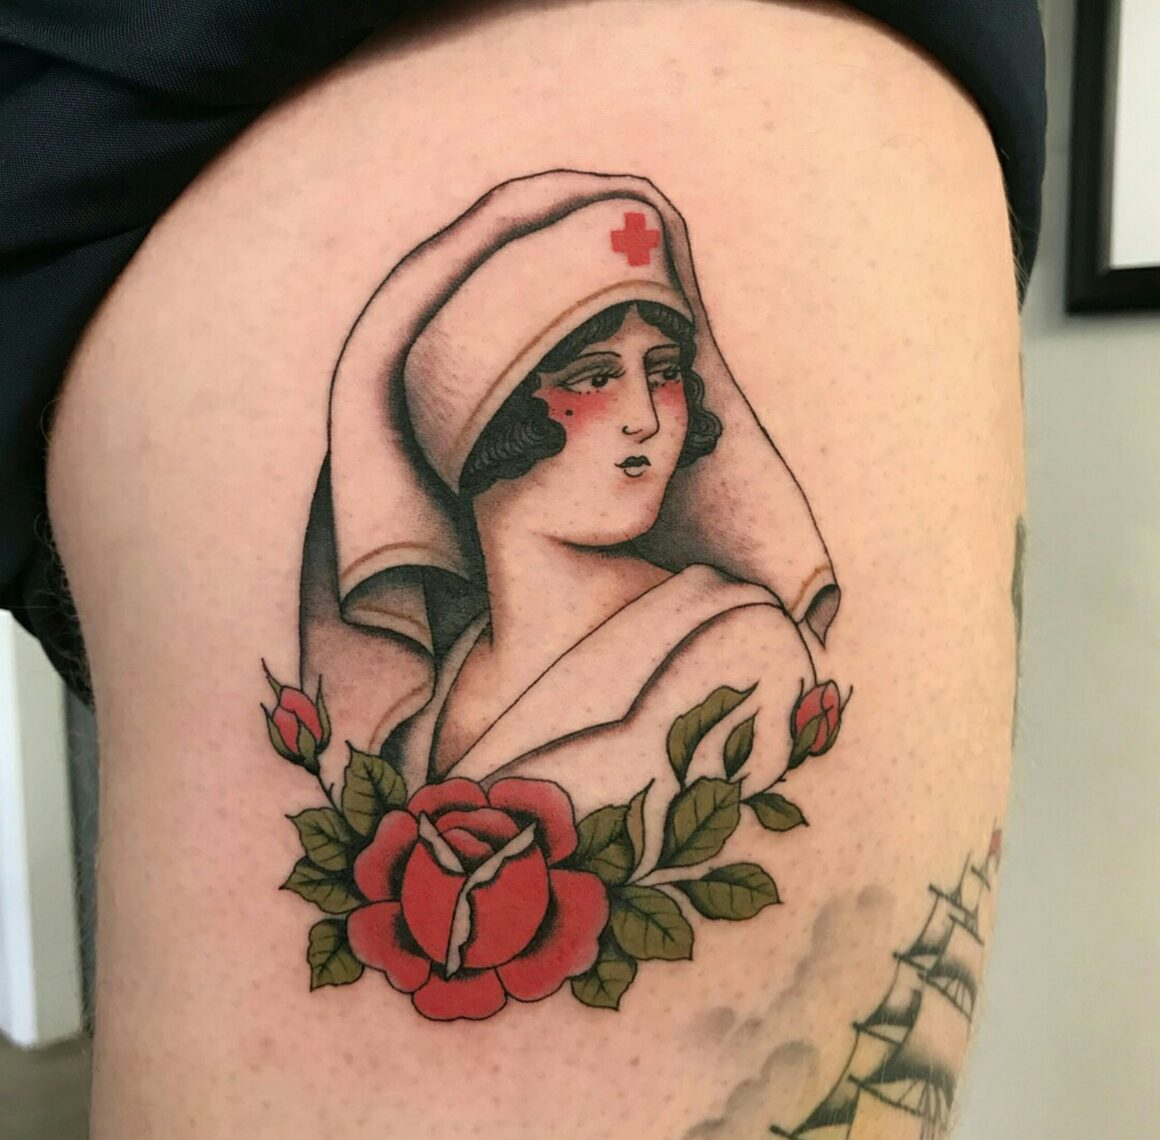 Olivia Dawn, Rambo's Tattoo Parlour, Manchester, UK